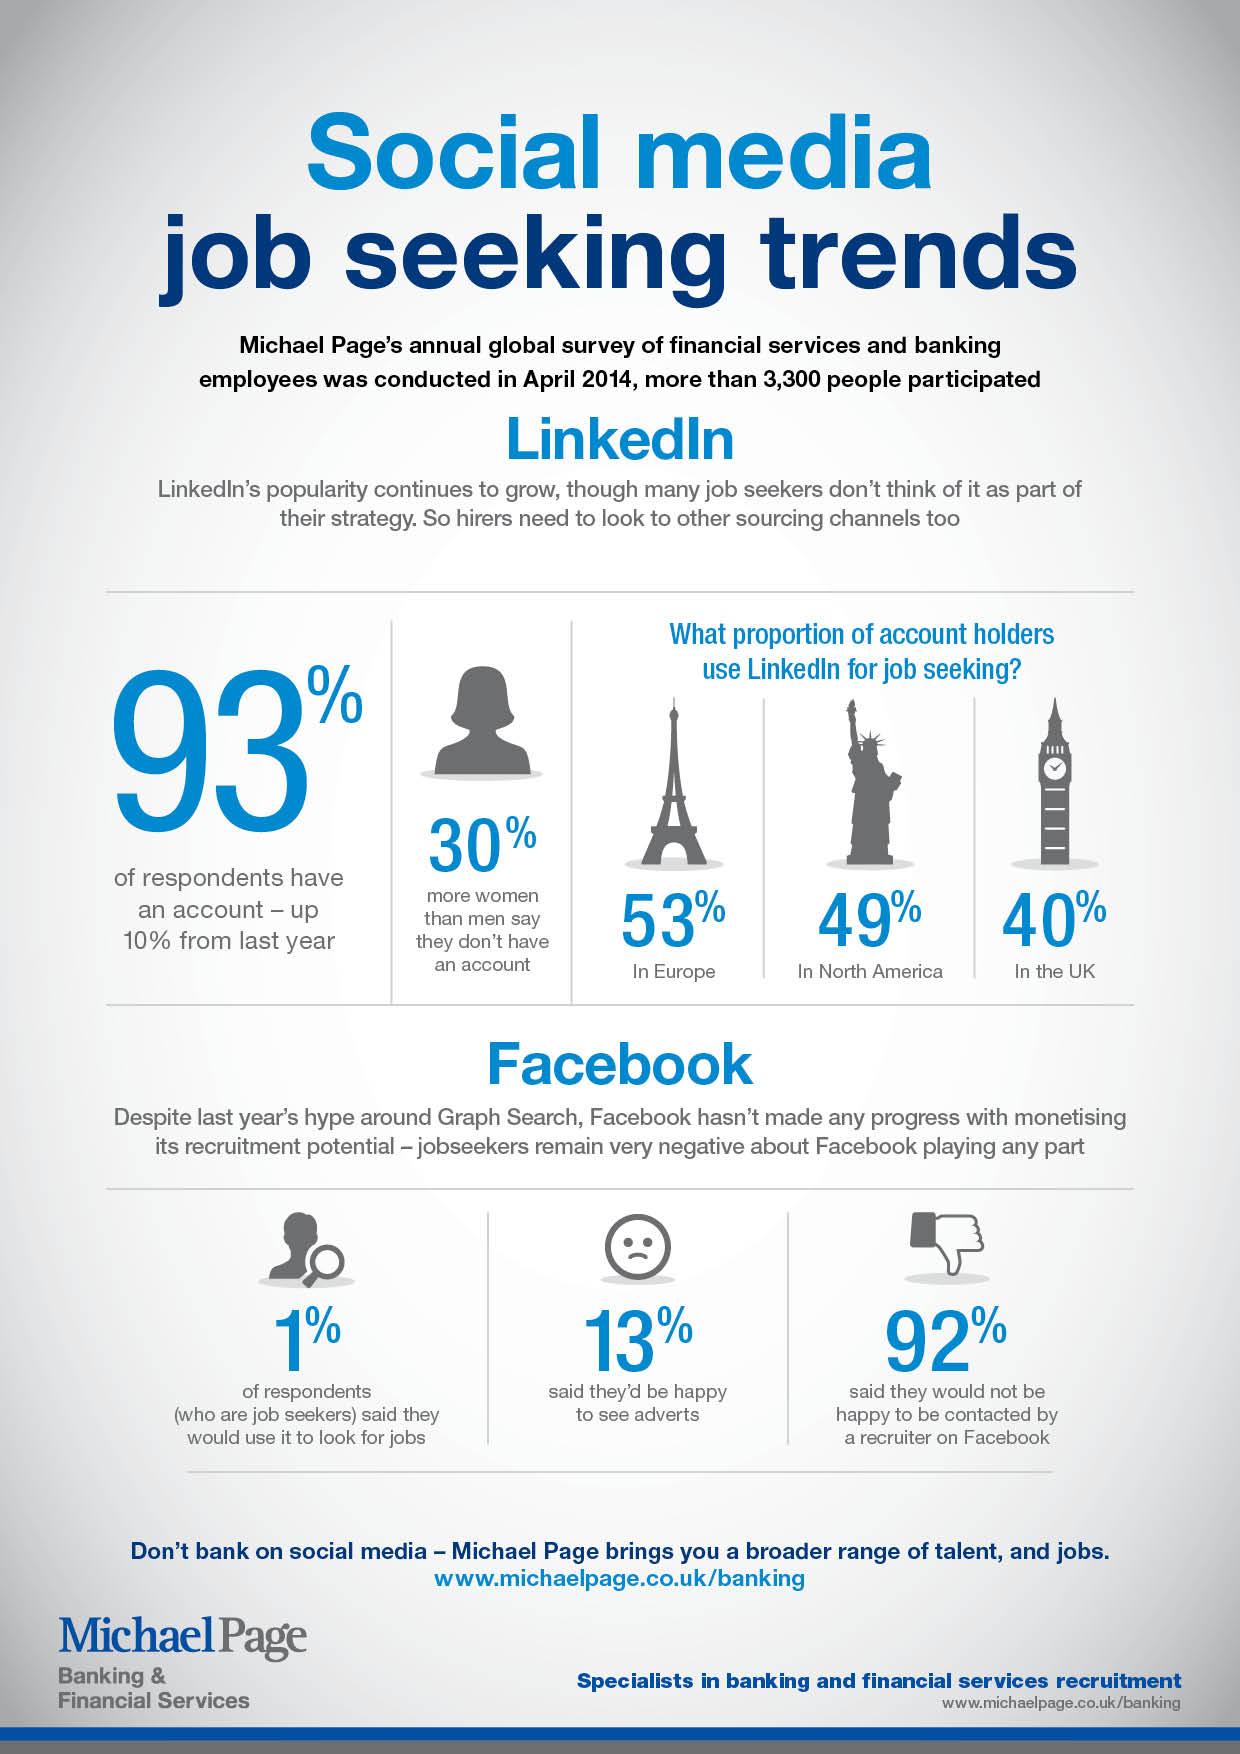 Social media job seeking trends